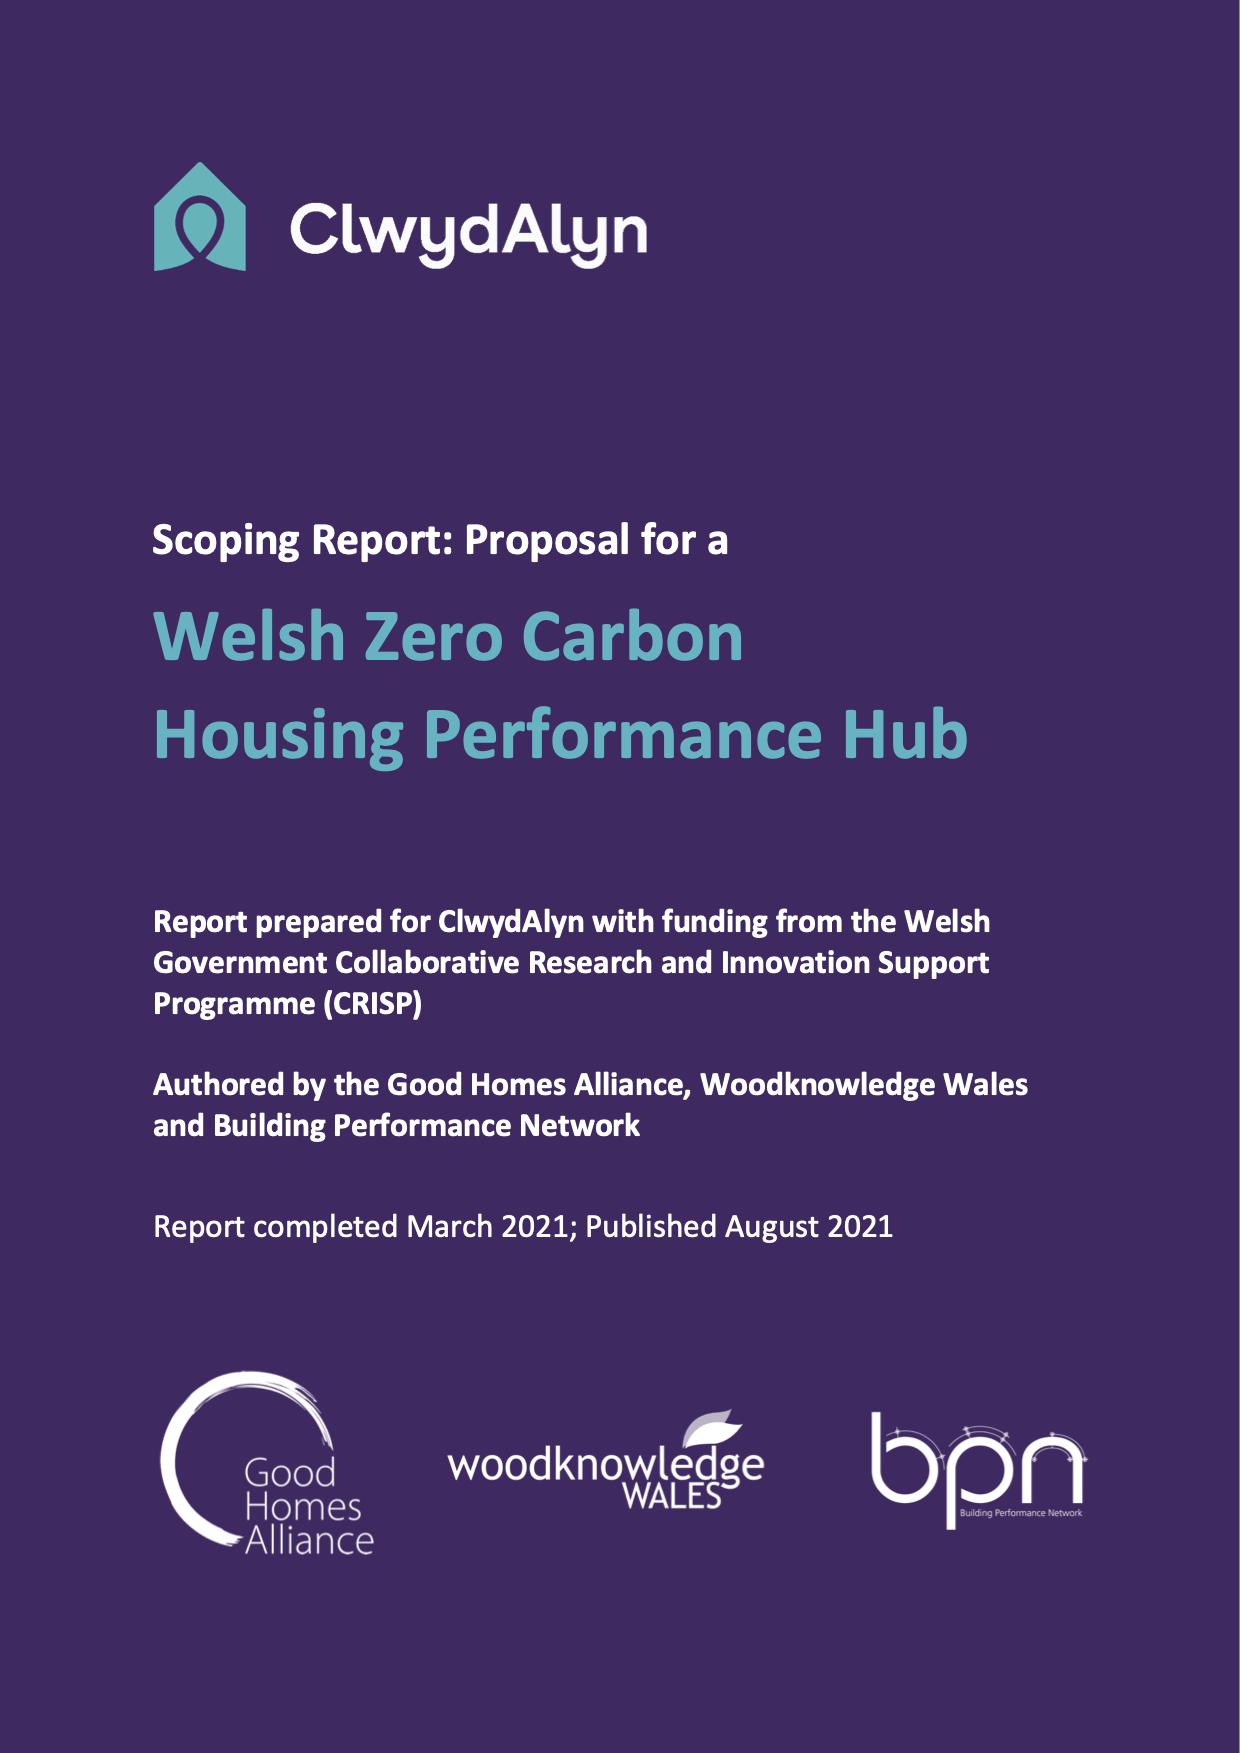 Welsh Zero Carbon Housing Performance Hub